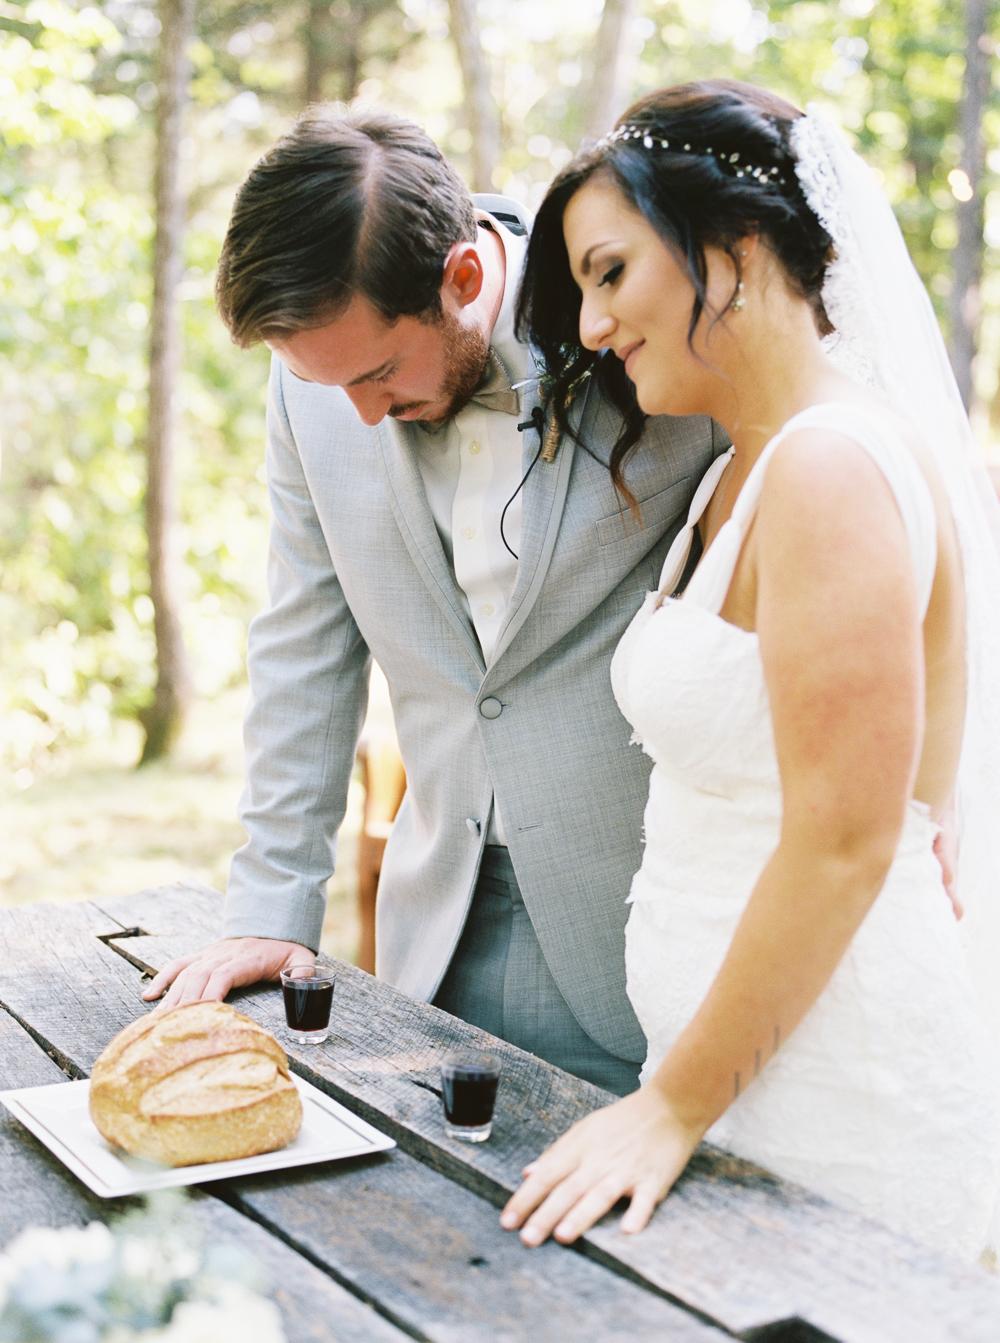 jamie+trey_wrens nest film wedding photographers natural light ©2016abigailbobophotography-24.jpg